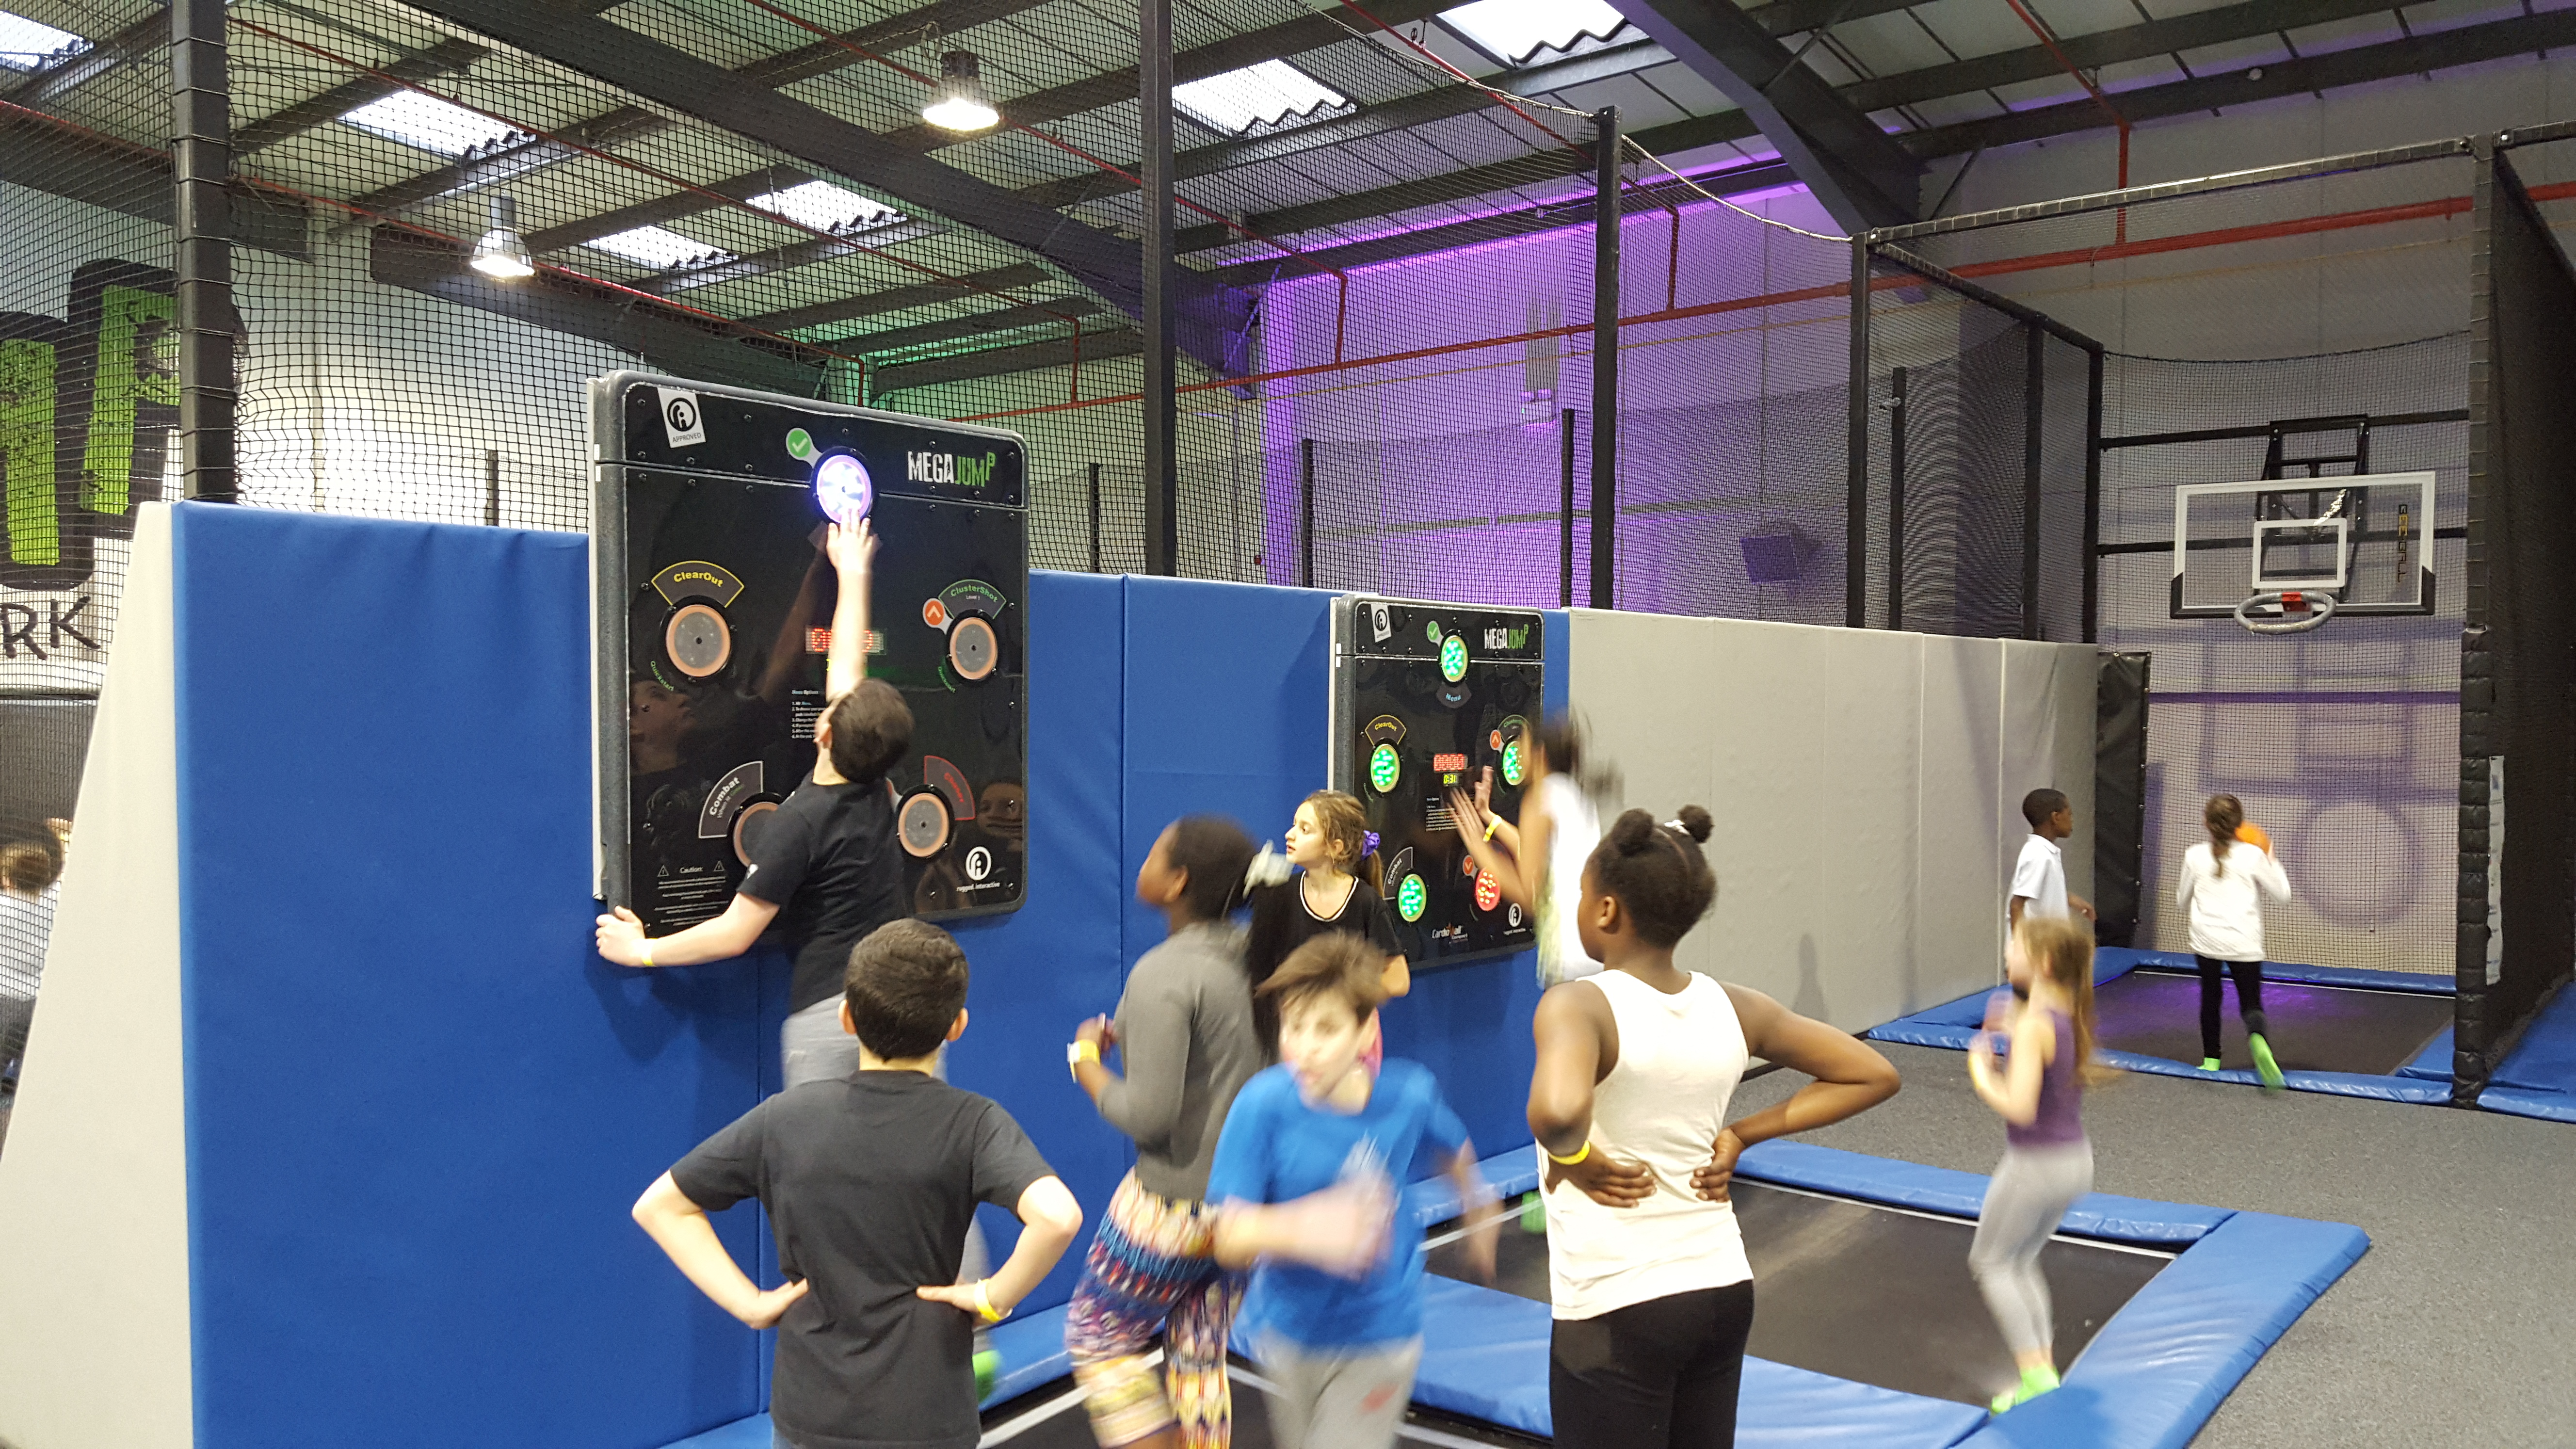 CardioWall FreeStyle at Mega Jump